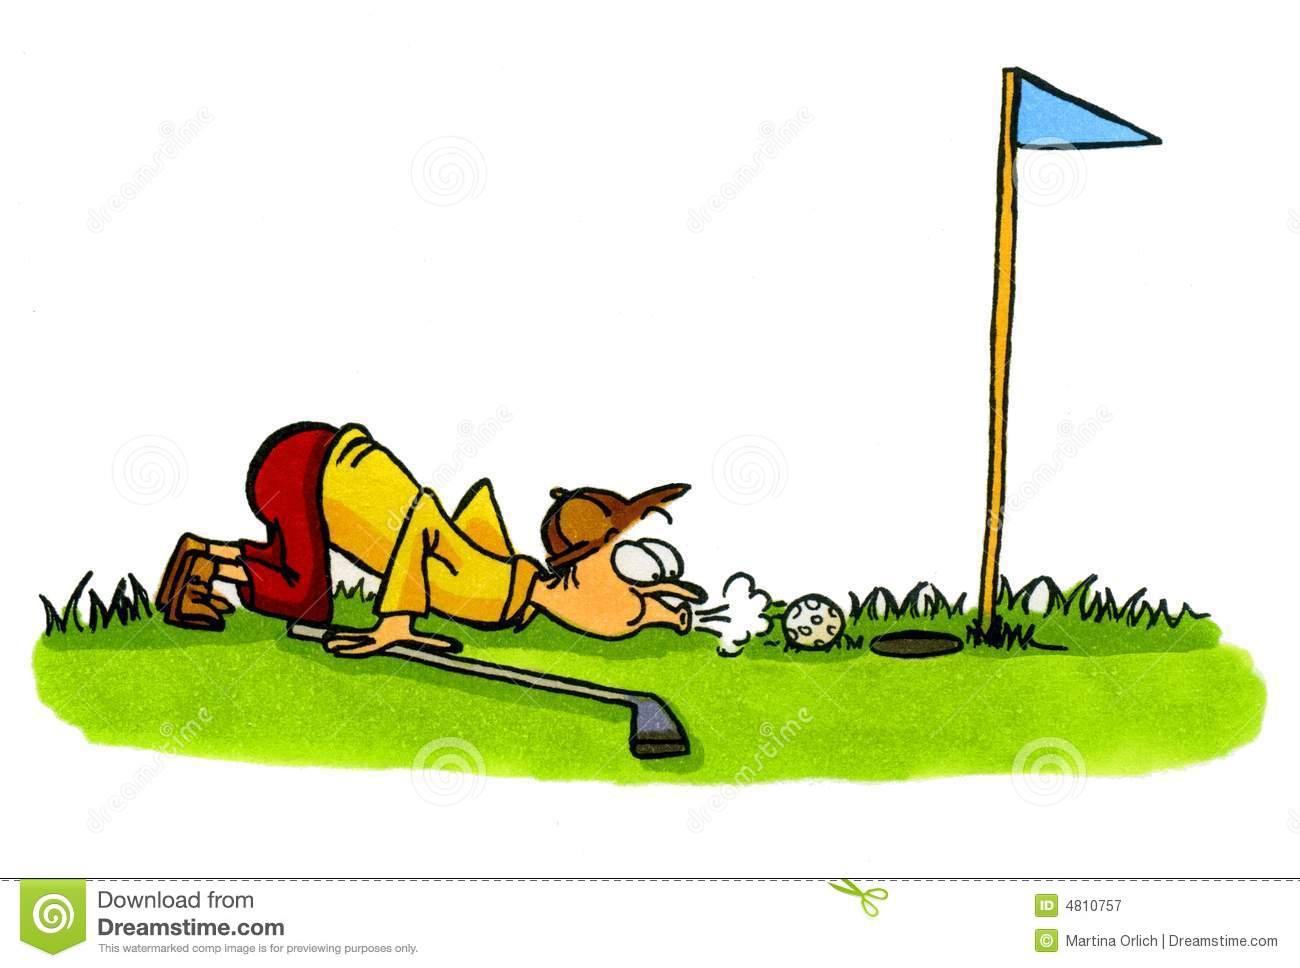 Fortwilliam Golf Club on irish pig cartoon, irish cartoon guys, irish rugby player cartoon, irish priest cartoon, irish cartoon characters, irish dog cartoon, irish dancer cartoon, irish birthday cartoon,